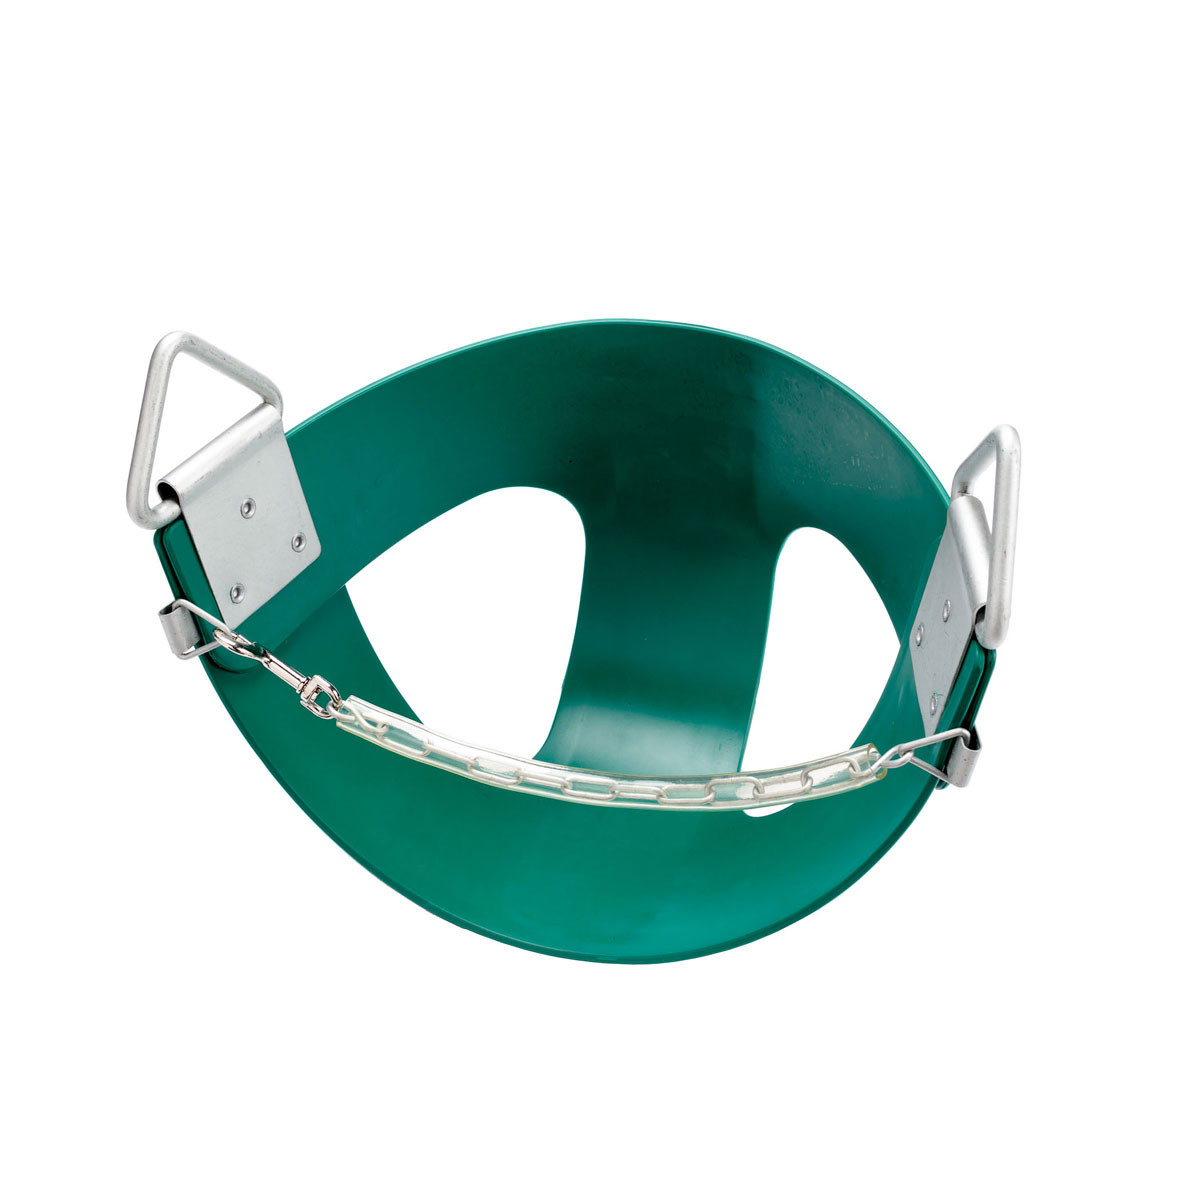 Commercial Rubber Half Bucket Swing Seat - Green